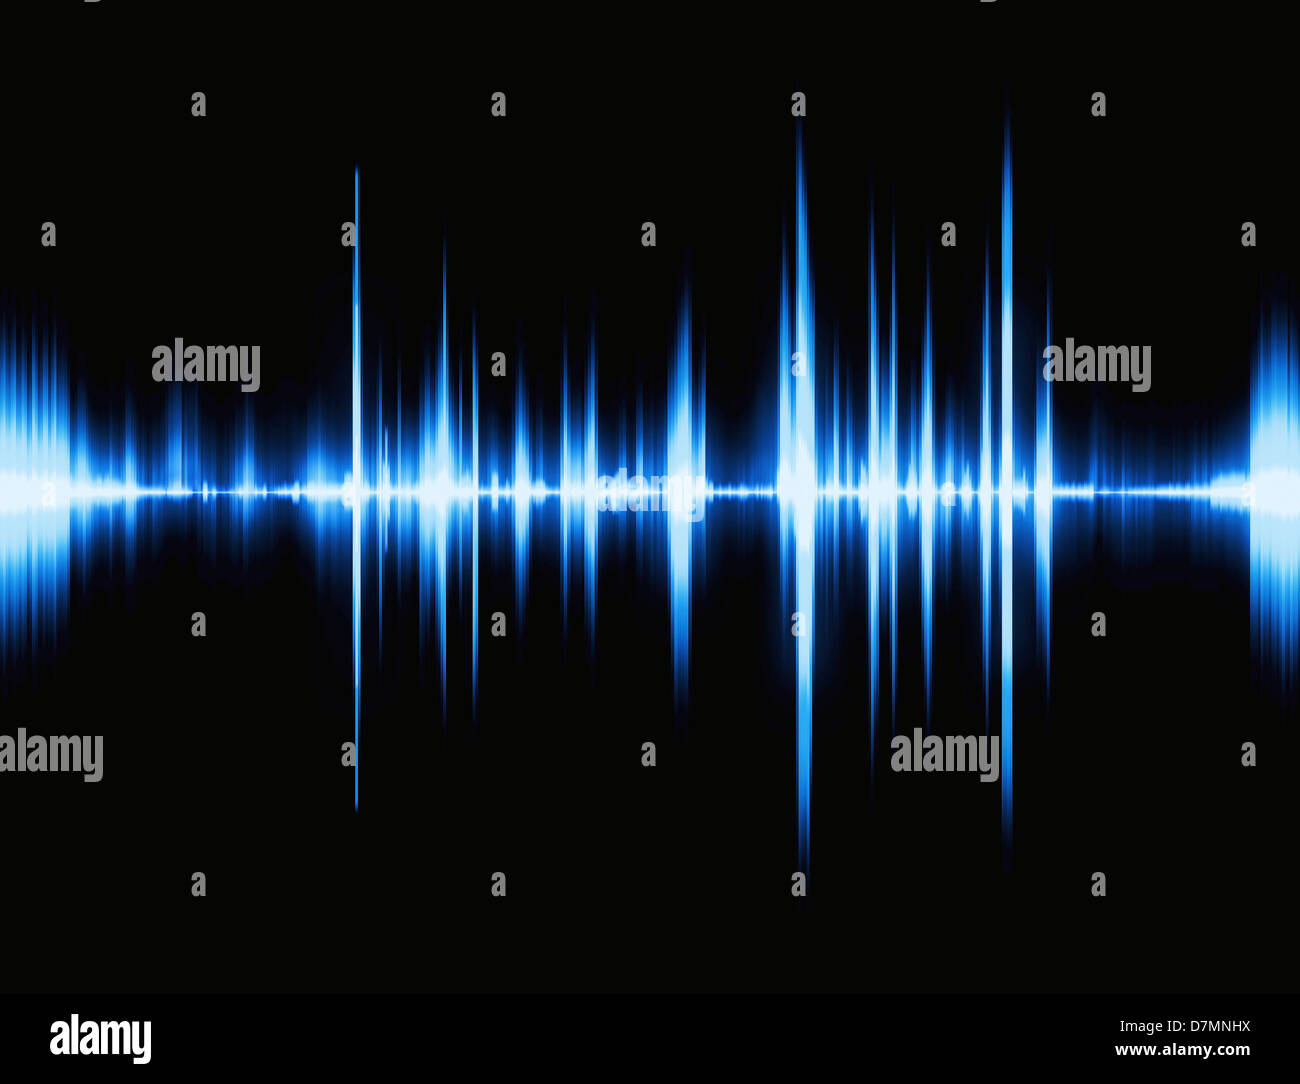 Sound waves, artwork - Stock Image